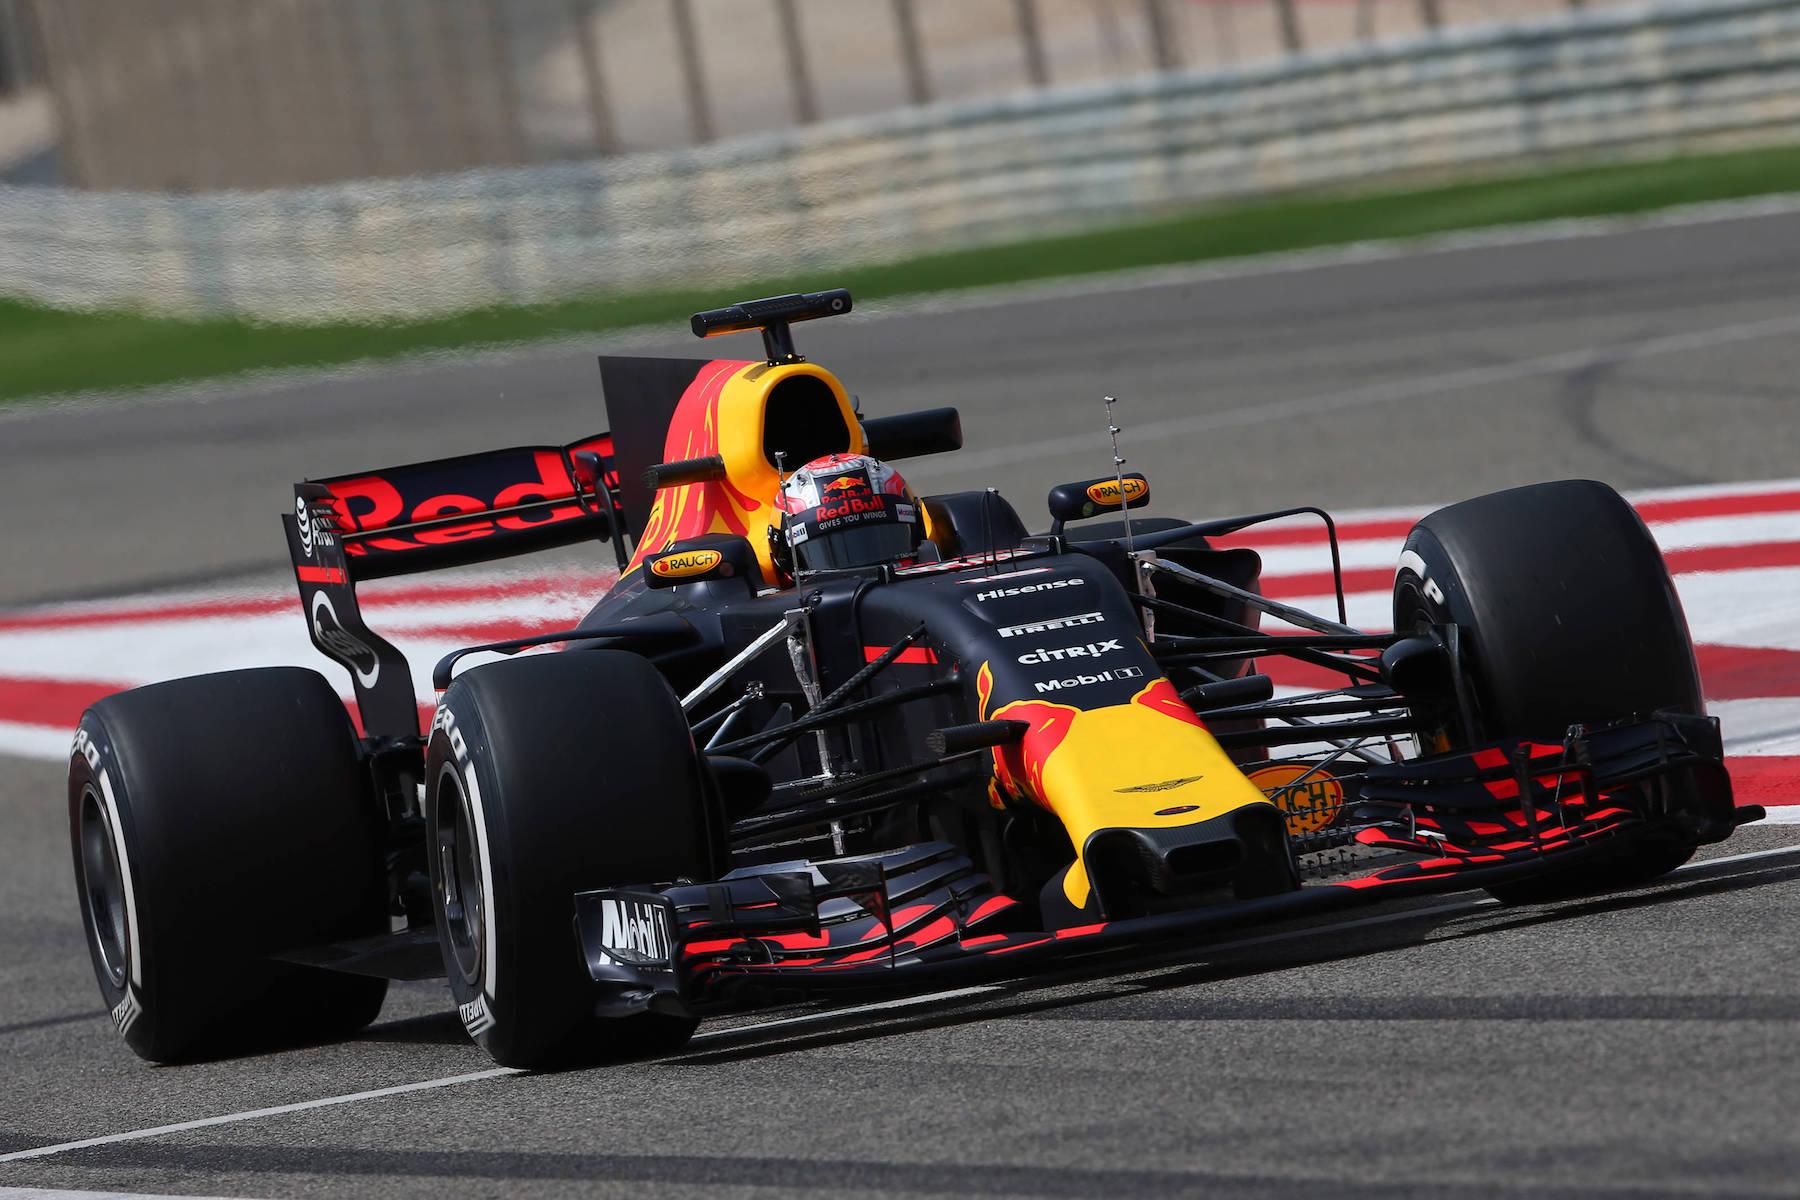 2017 Pierre Gasly | Red Bull RB13 | 2017 Bahrain Test 1 copy.jpg